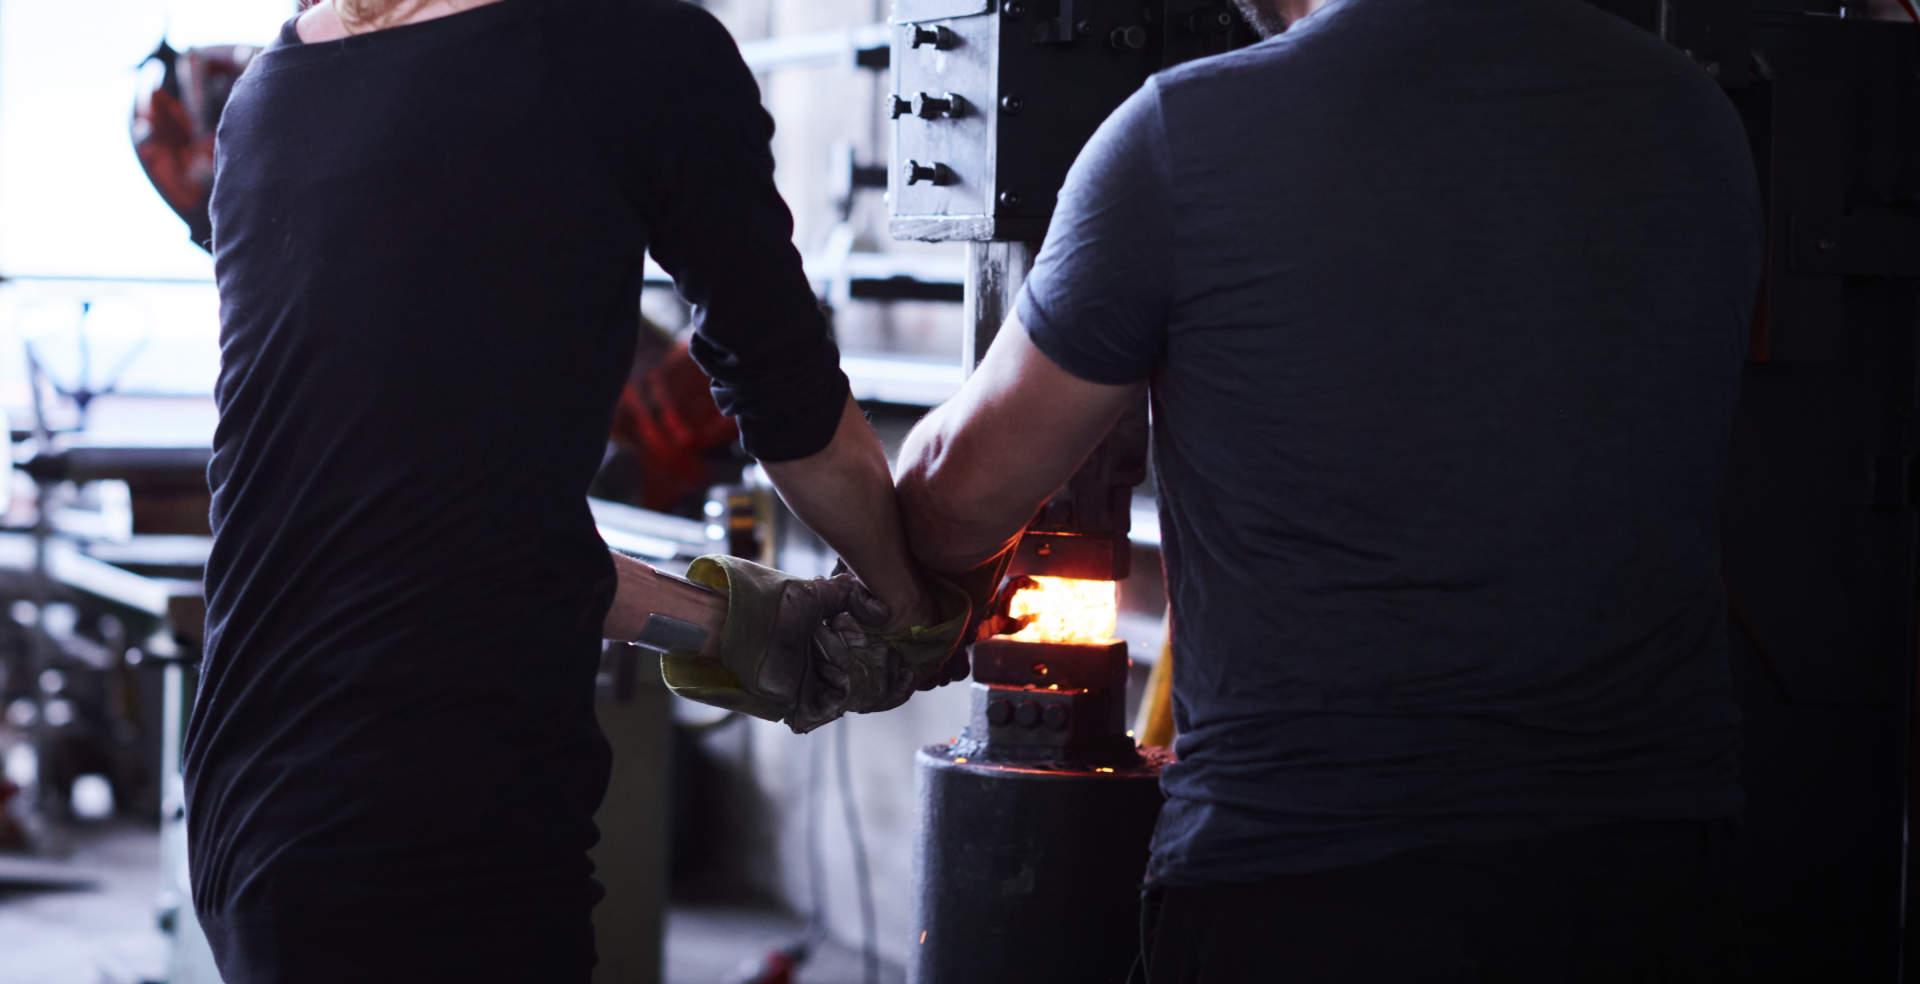 Sommeraktion 2019 - SchmiedekurseSummer Special 2019 - Forging Courses - Spezialrabatt auf Schmiedekurse im Sommer…Special Reduction on Forging Courses over the summer…